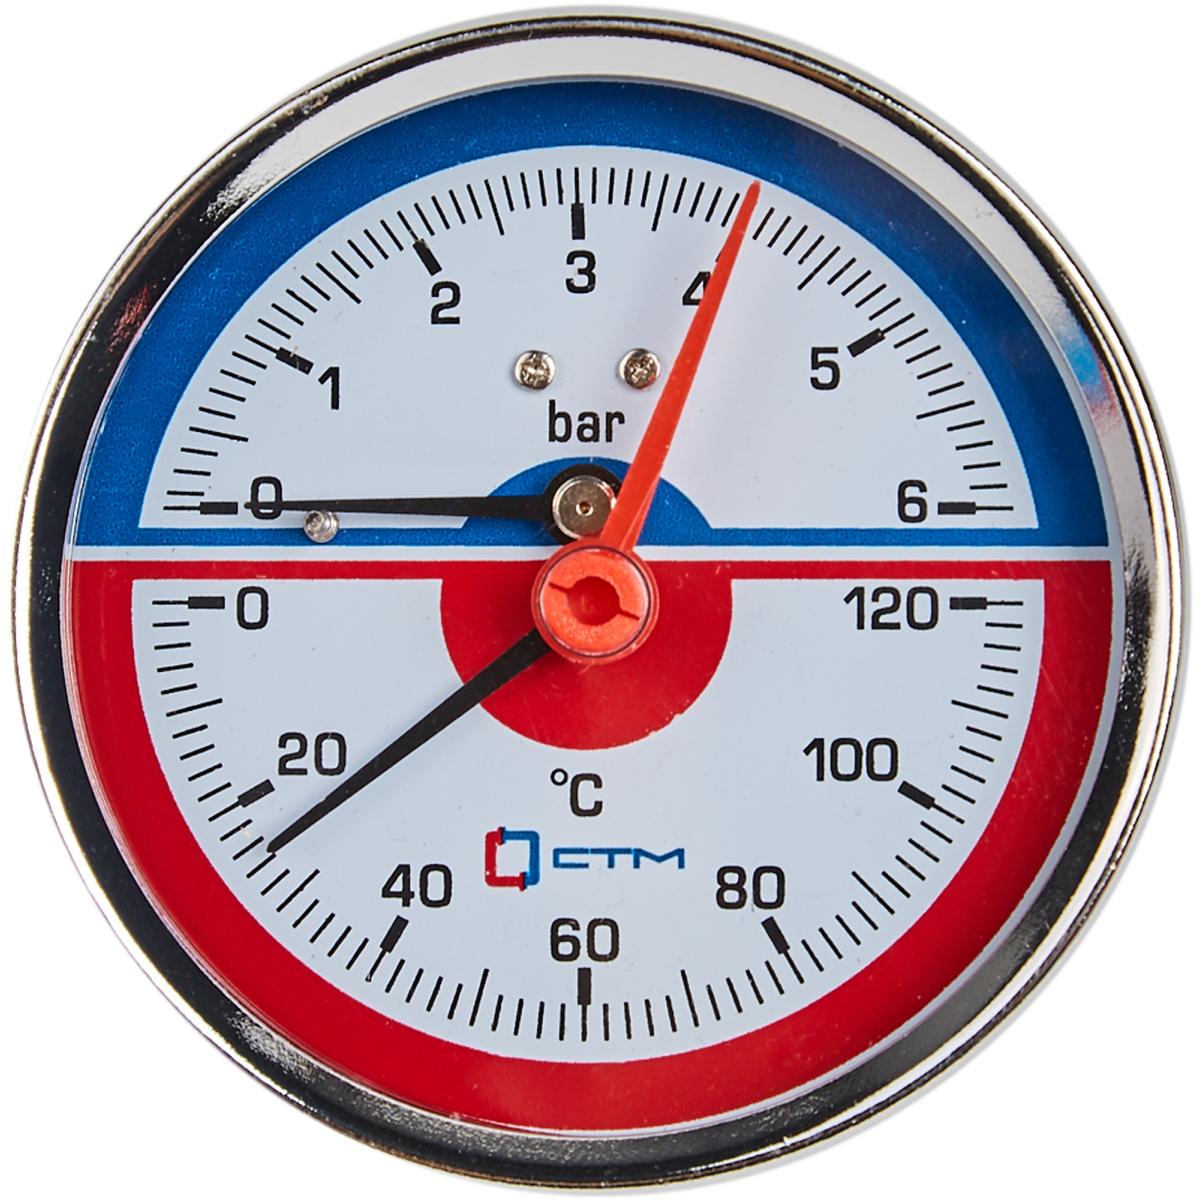 Термоманометр горизонтальный 1/2 120 град 6 бар